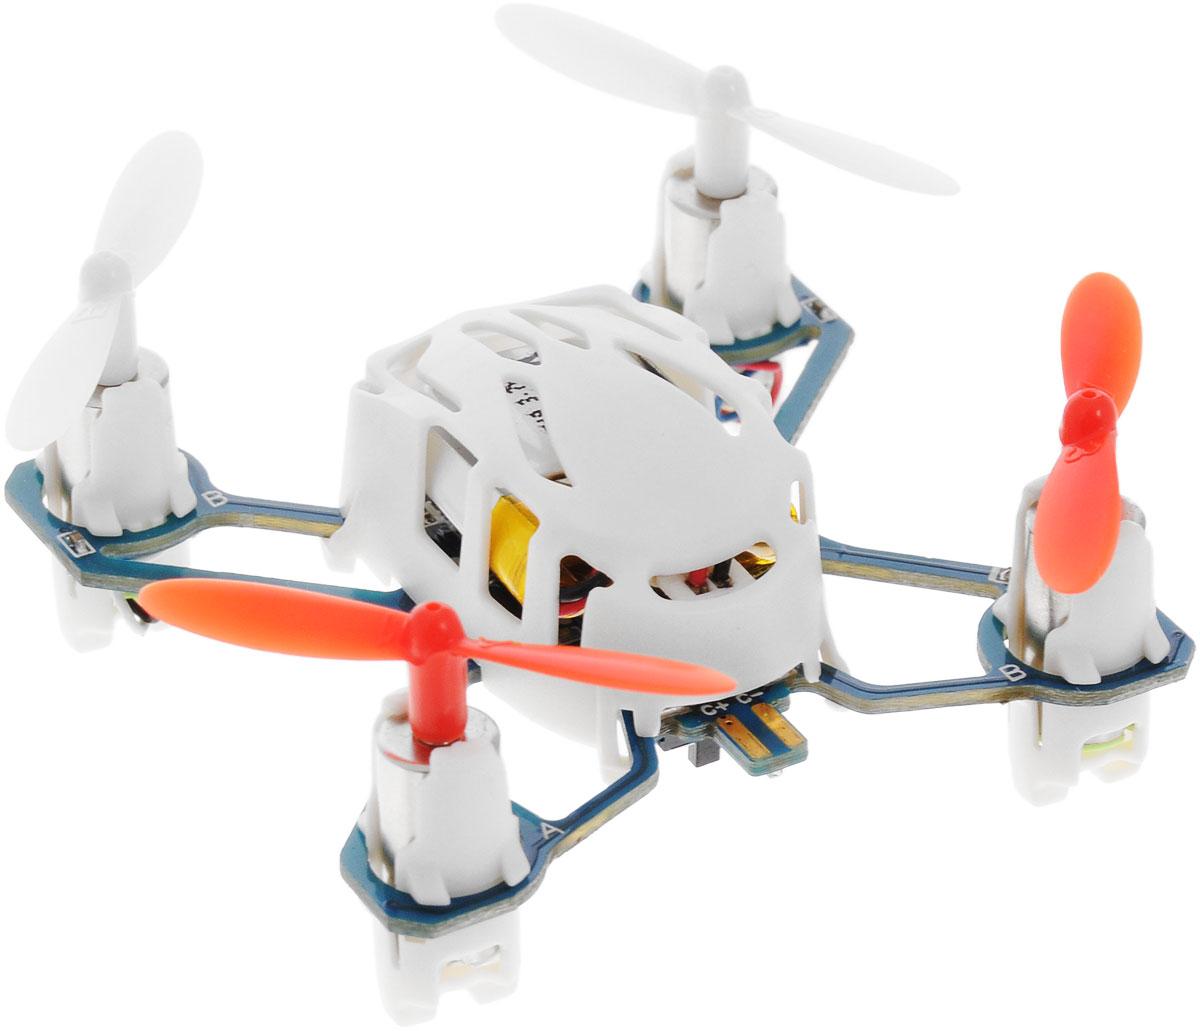 Hubsan Квадрокоптер на радиоуправлении Q4 Nano